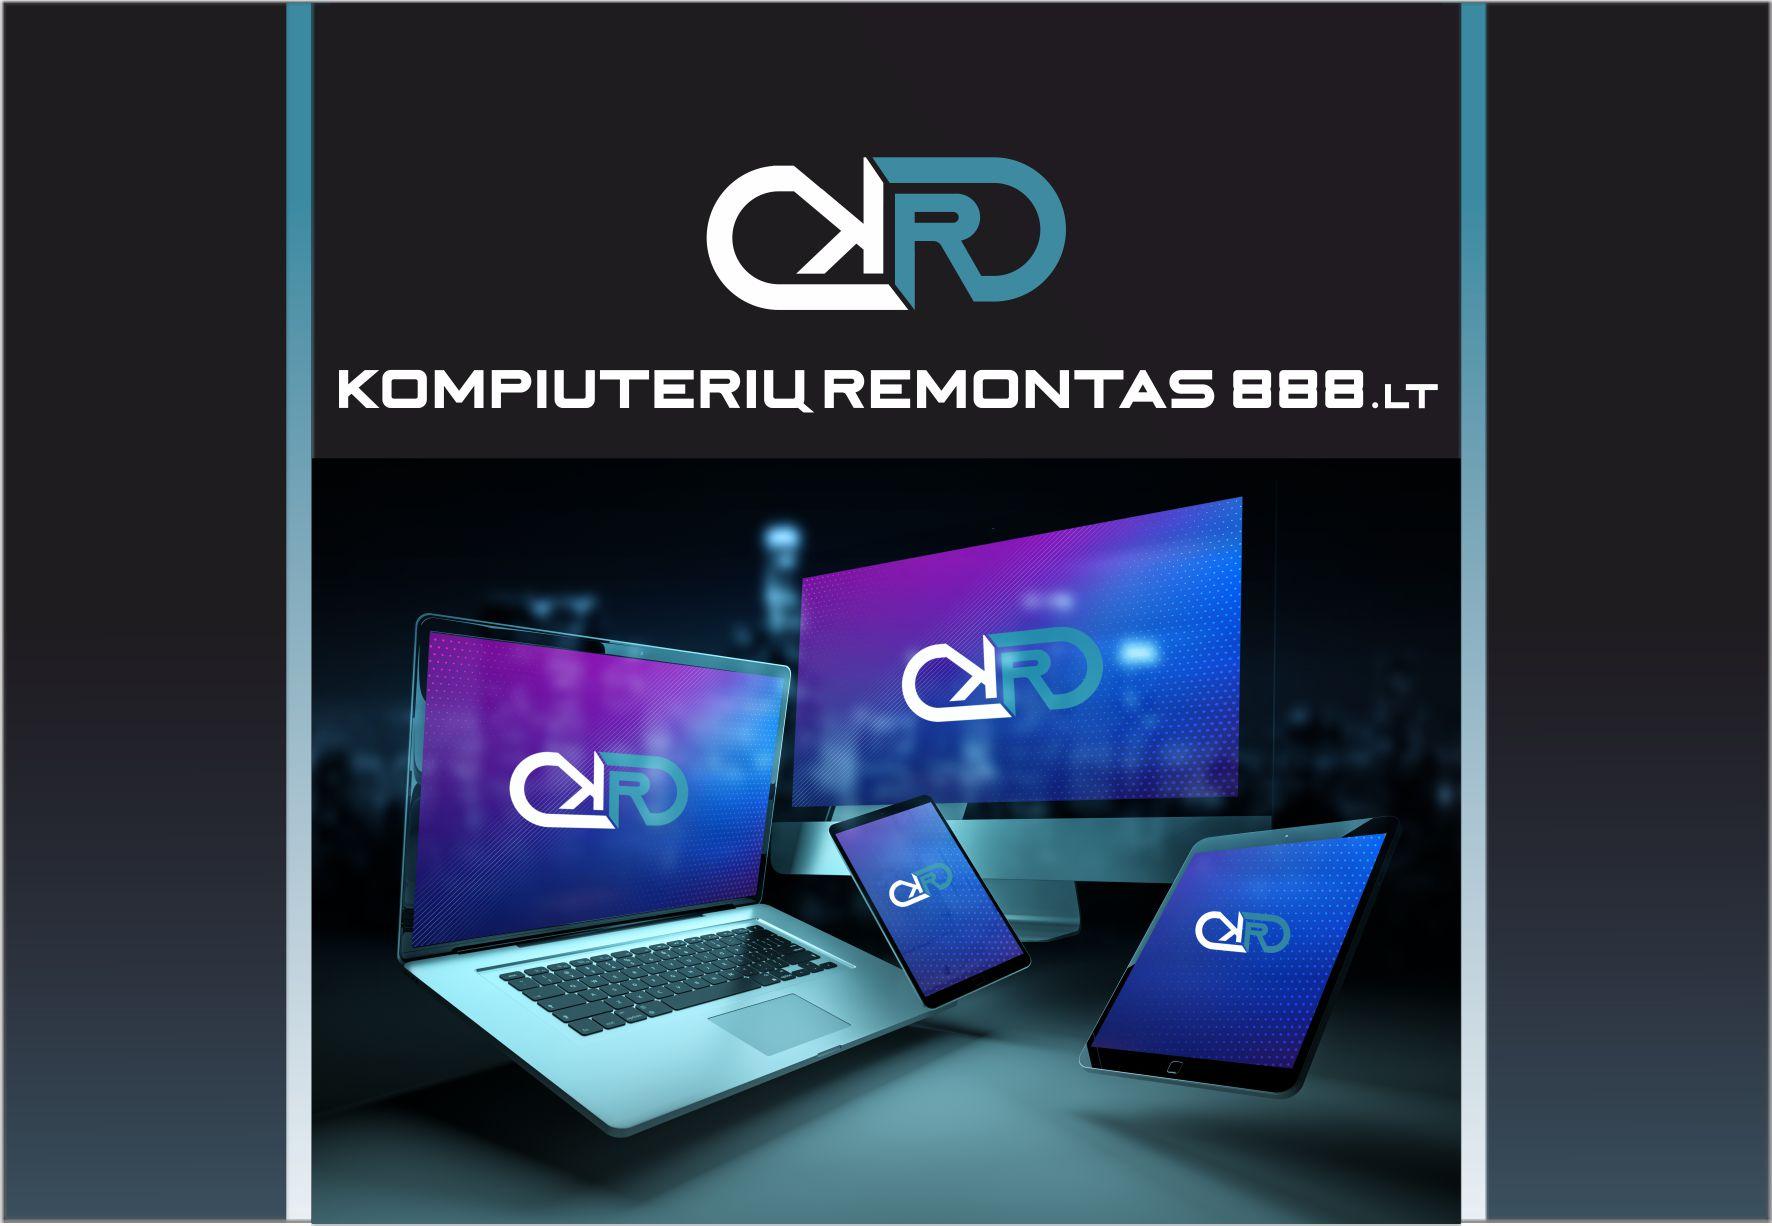 Kompiuterių ir Telefonų Remontas [Servisas] Žirmūnų g. 48A | Mob. tel.: 8 623 85 888